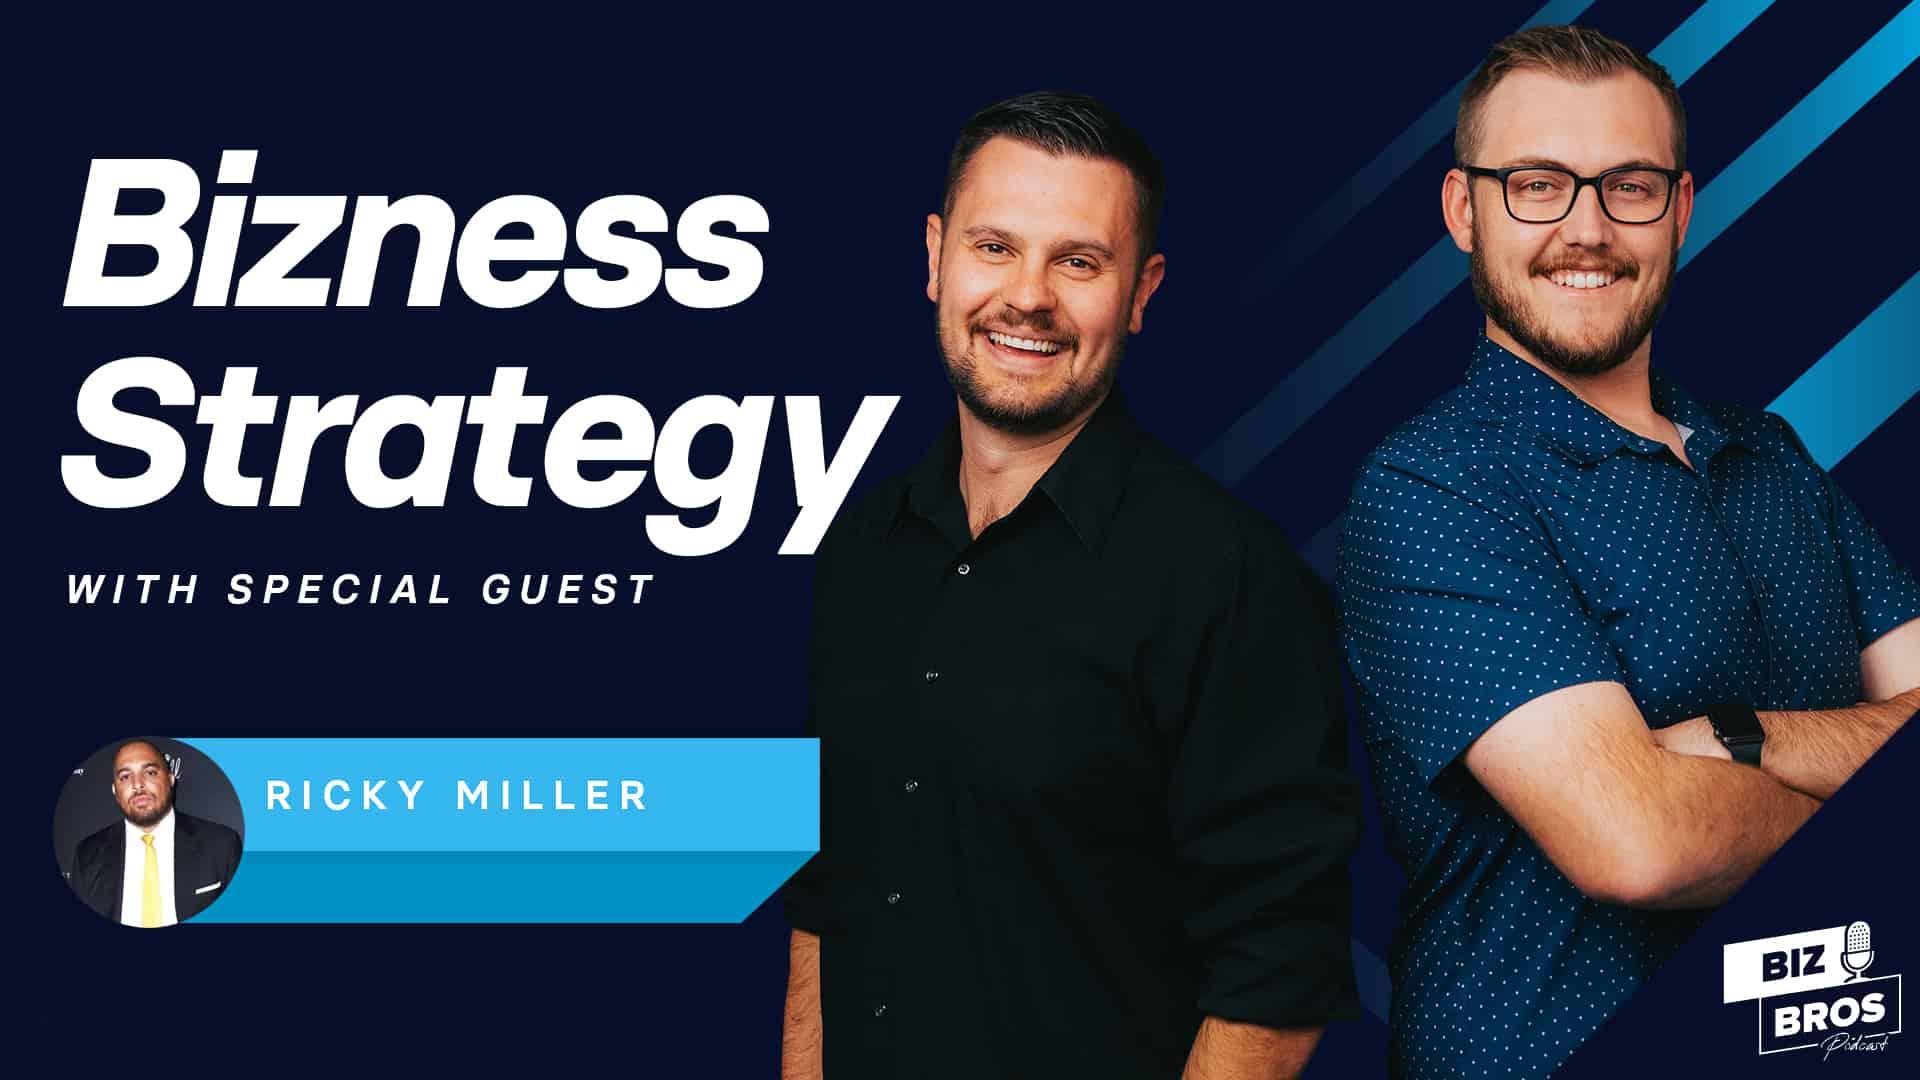 Inspiring Others Through Entrepreneurship with Ricky Miller